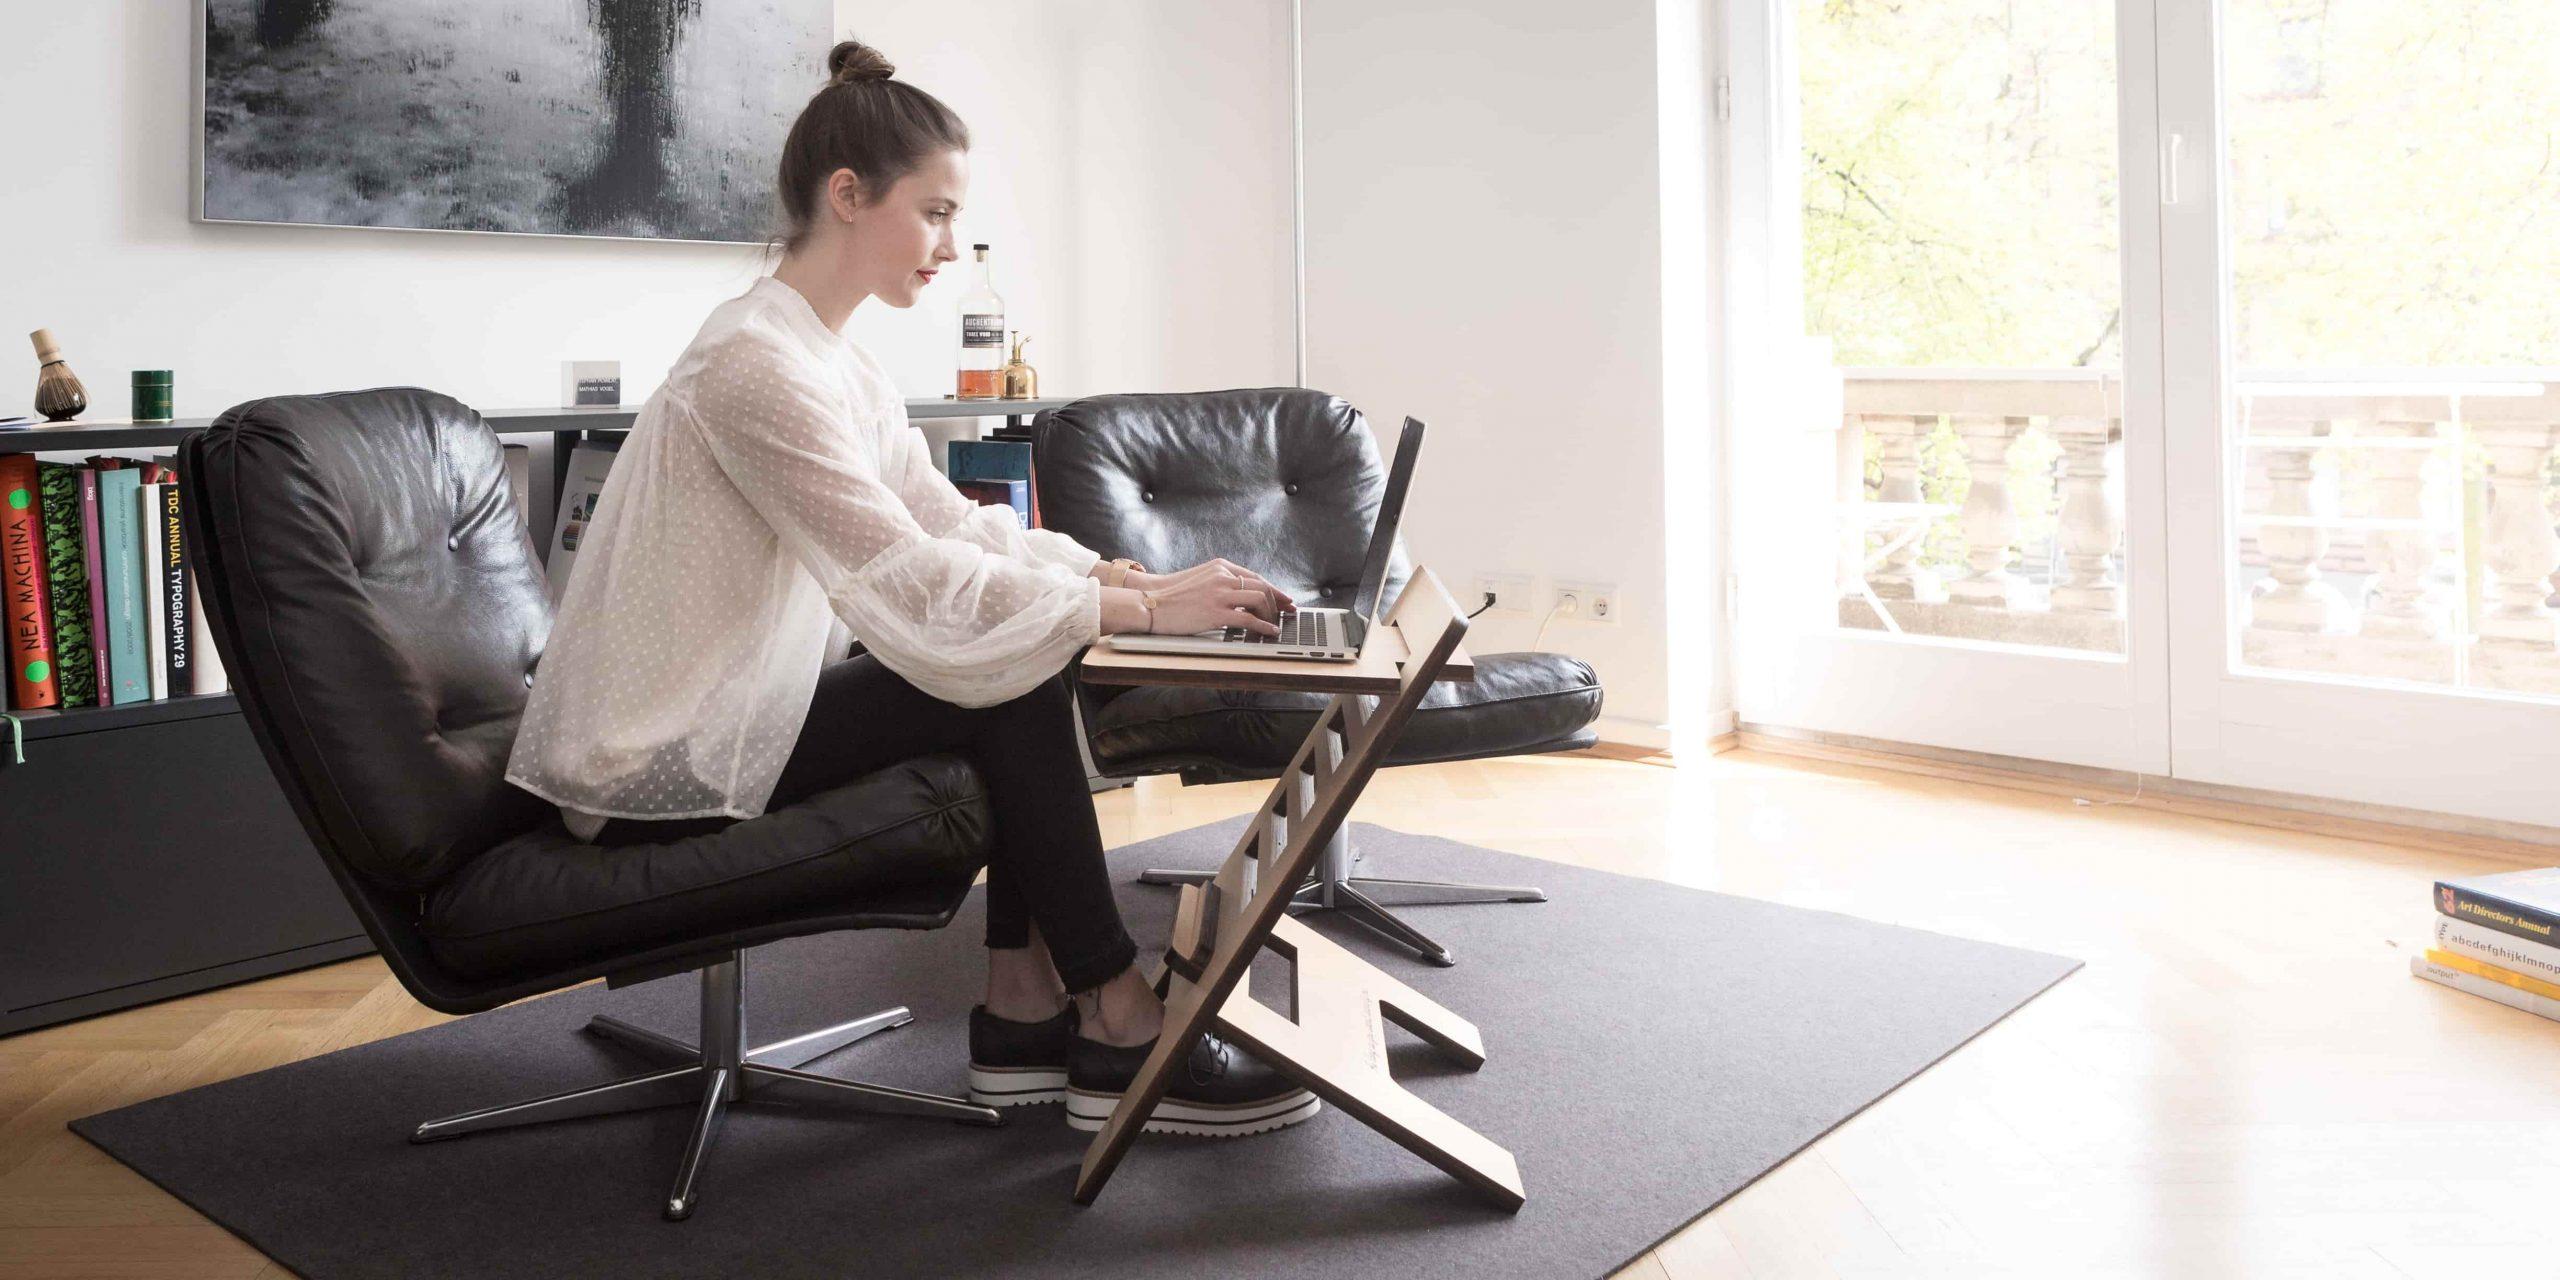 Producten die thuiswerken prettiger maken